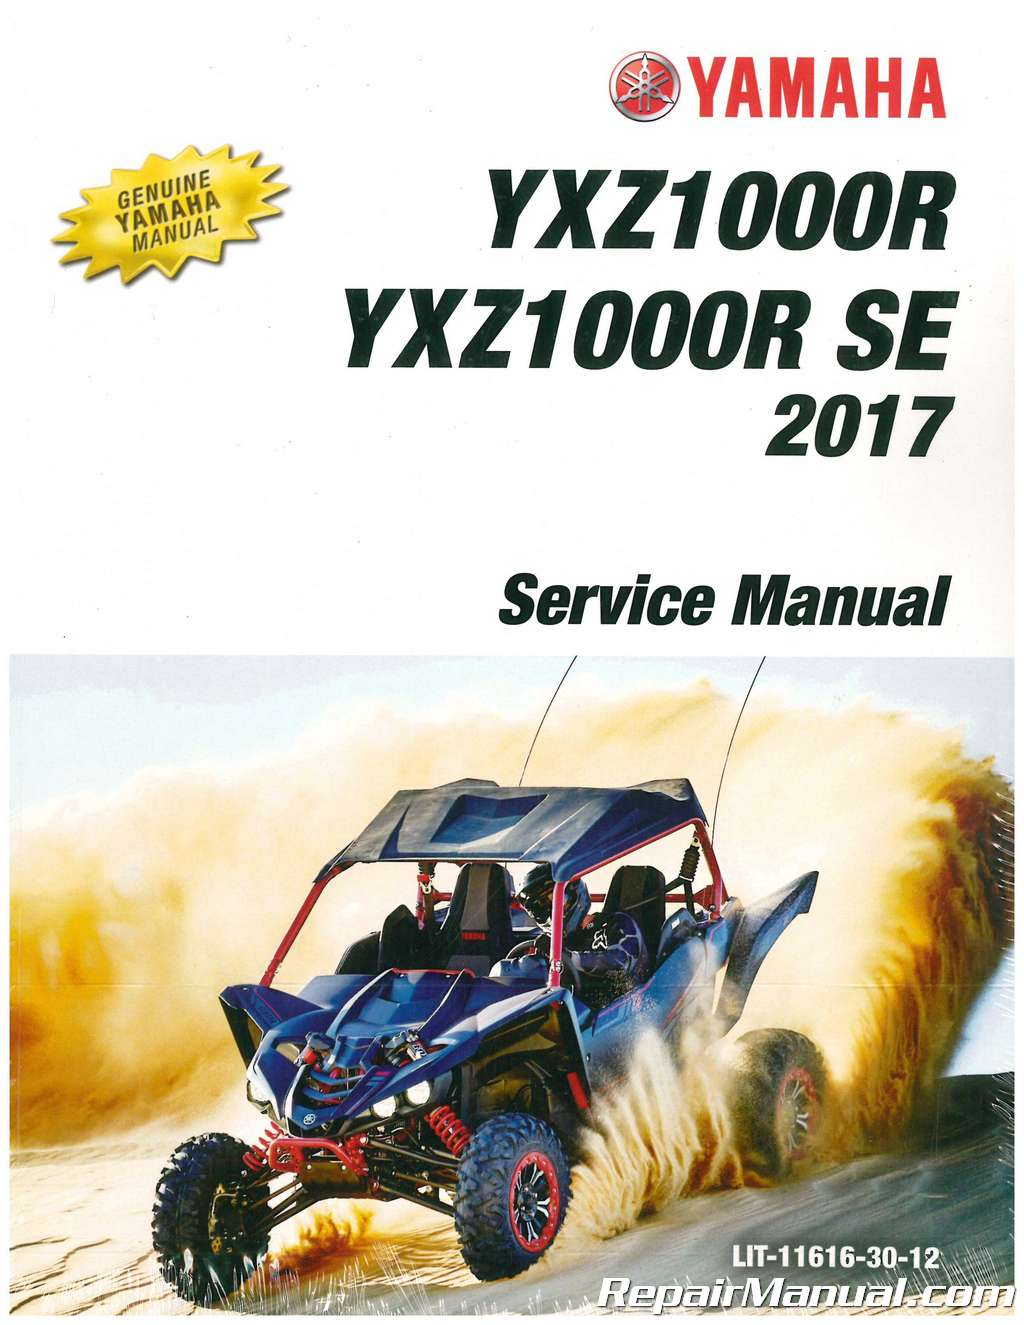 Yamaha 2019 YXZ1000R EPS SS Service Manual